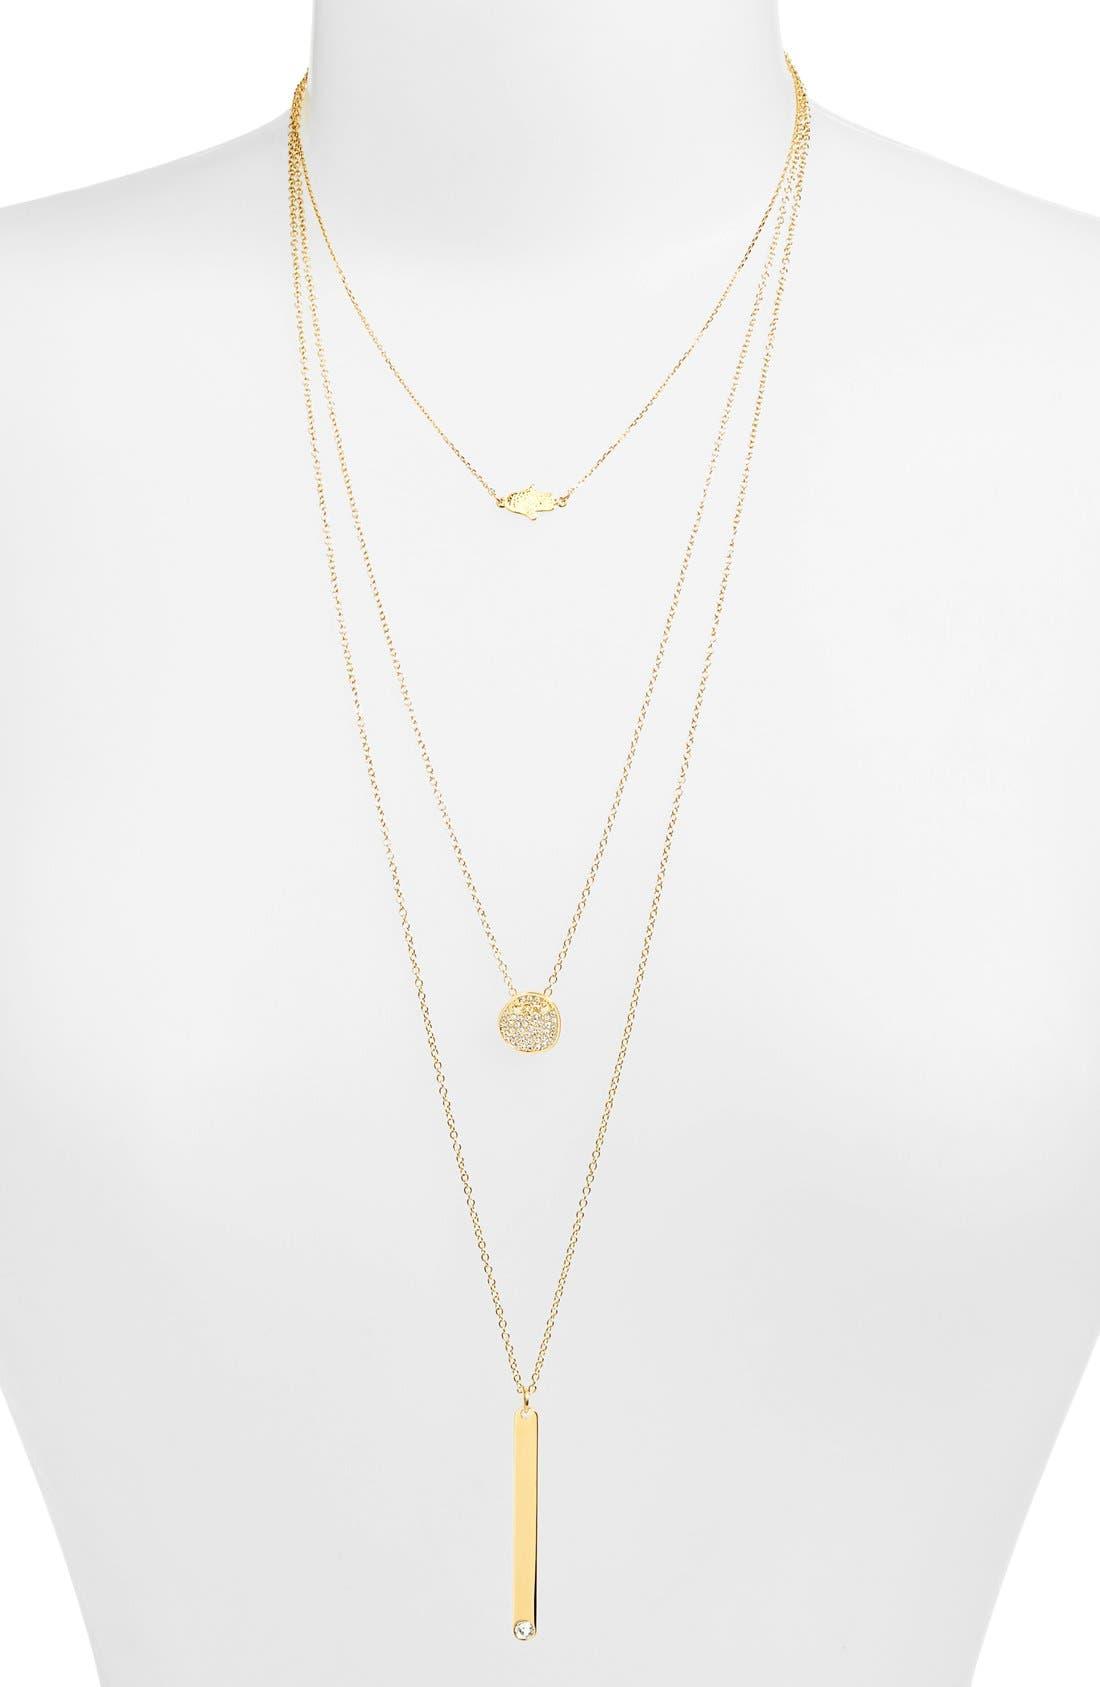 Main Image - BaubleBar 'Modern Metallics' 14k-Gold Plate Layered Necklace (Set of 3) (Nordstrom Exclusive)